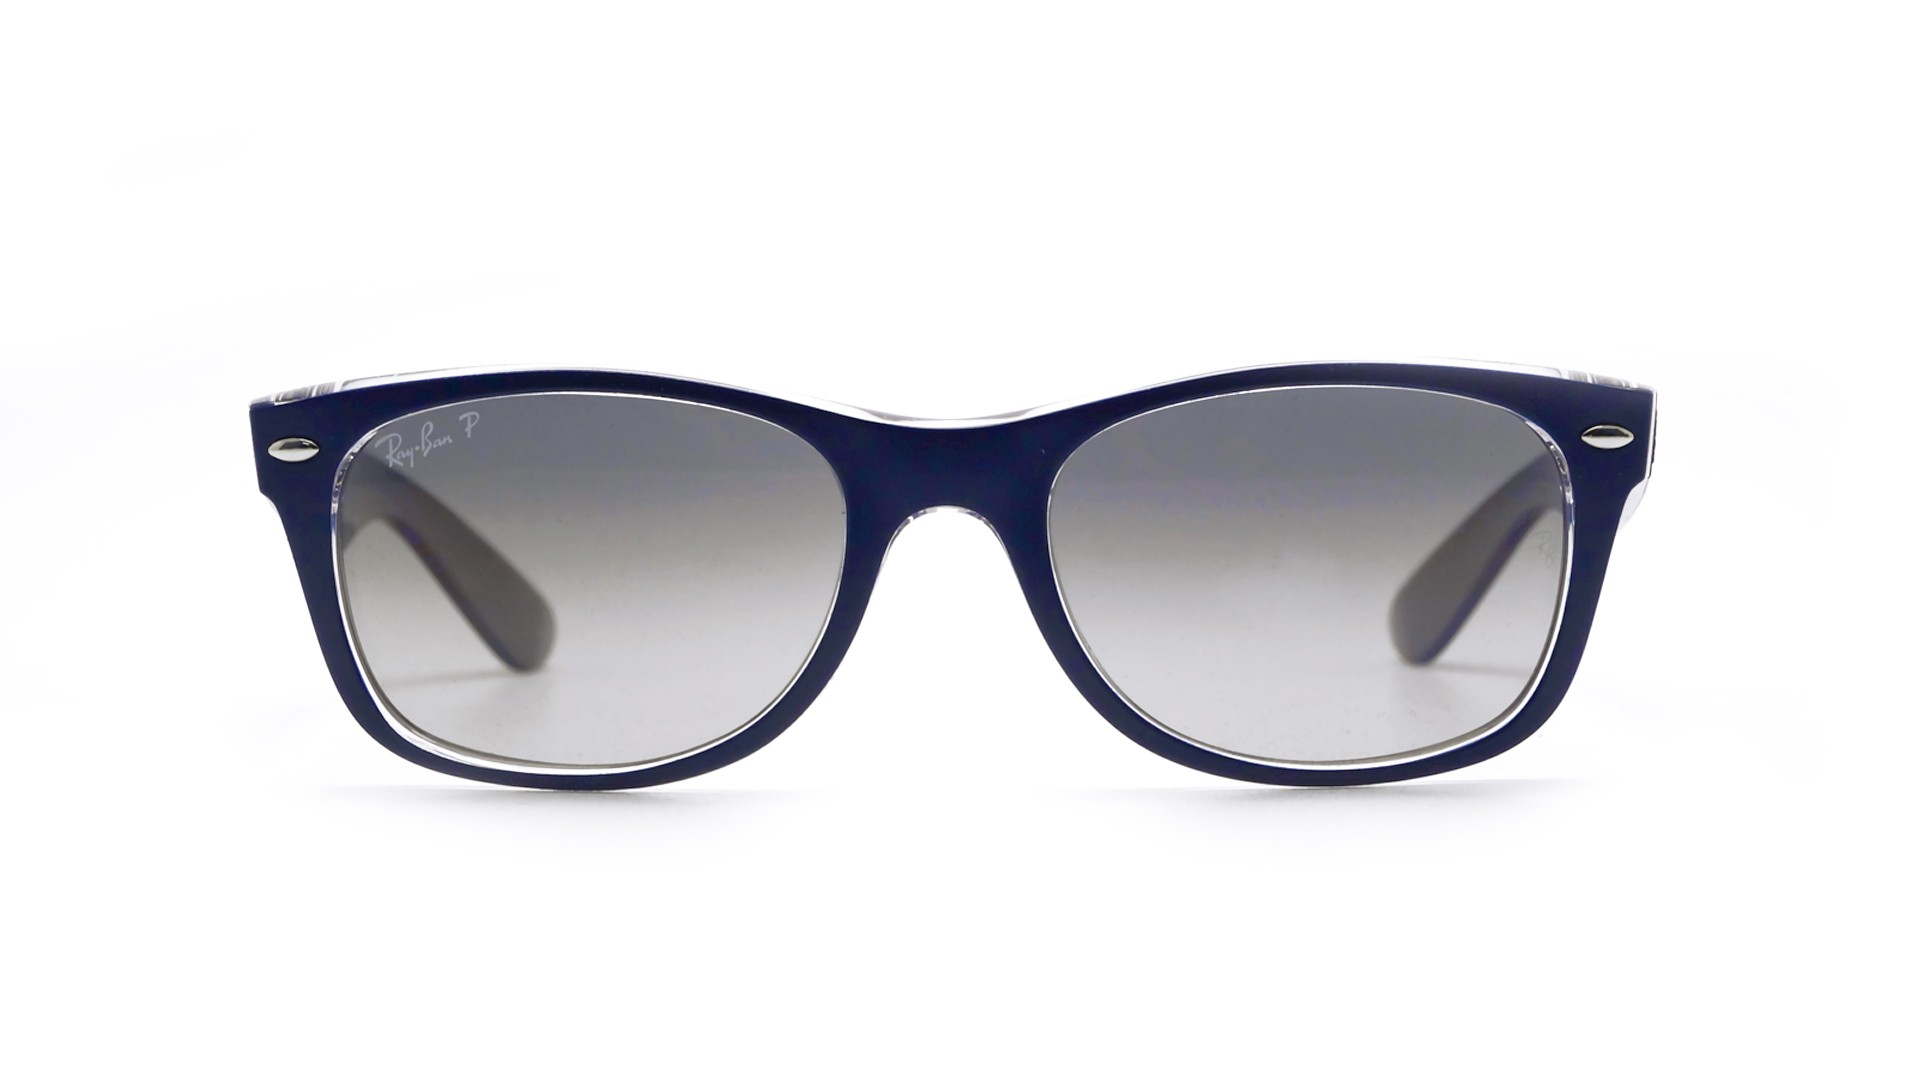 03360a6ba0e Sunglasses Ray-Ban New Wayfarer Blue RB2132 6053 M3 55-18 Large Polarized  Gradient